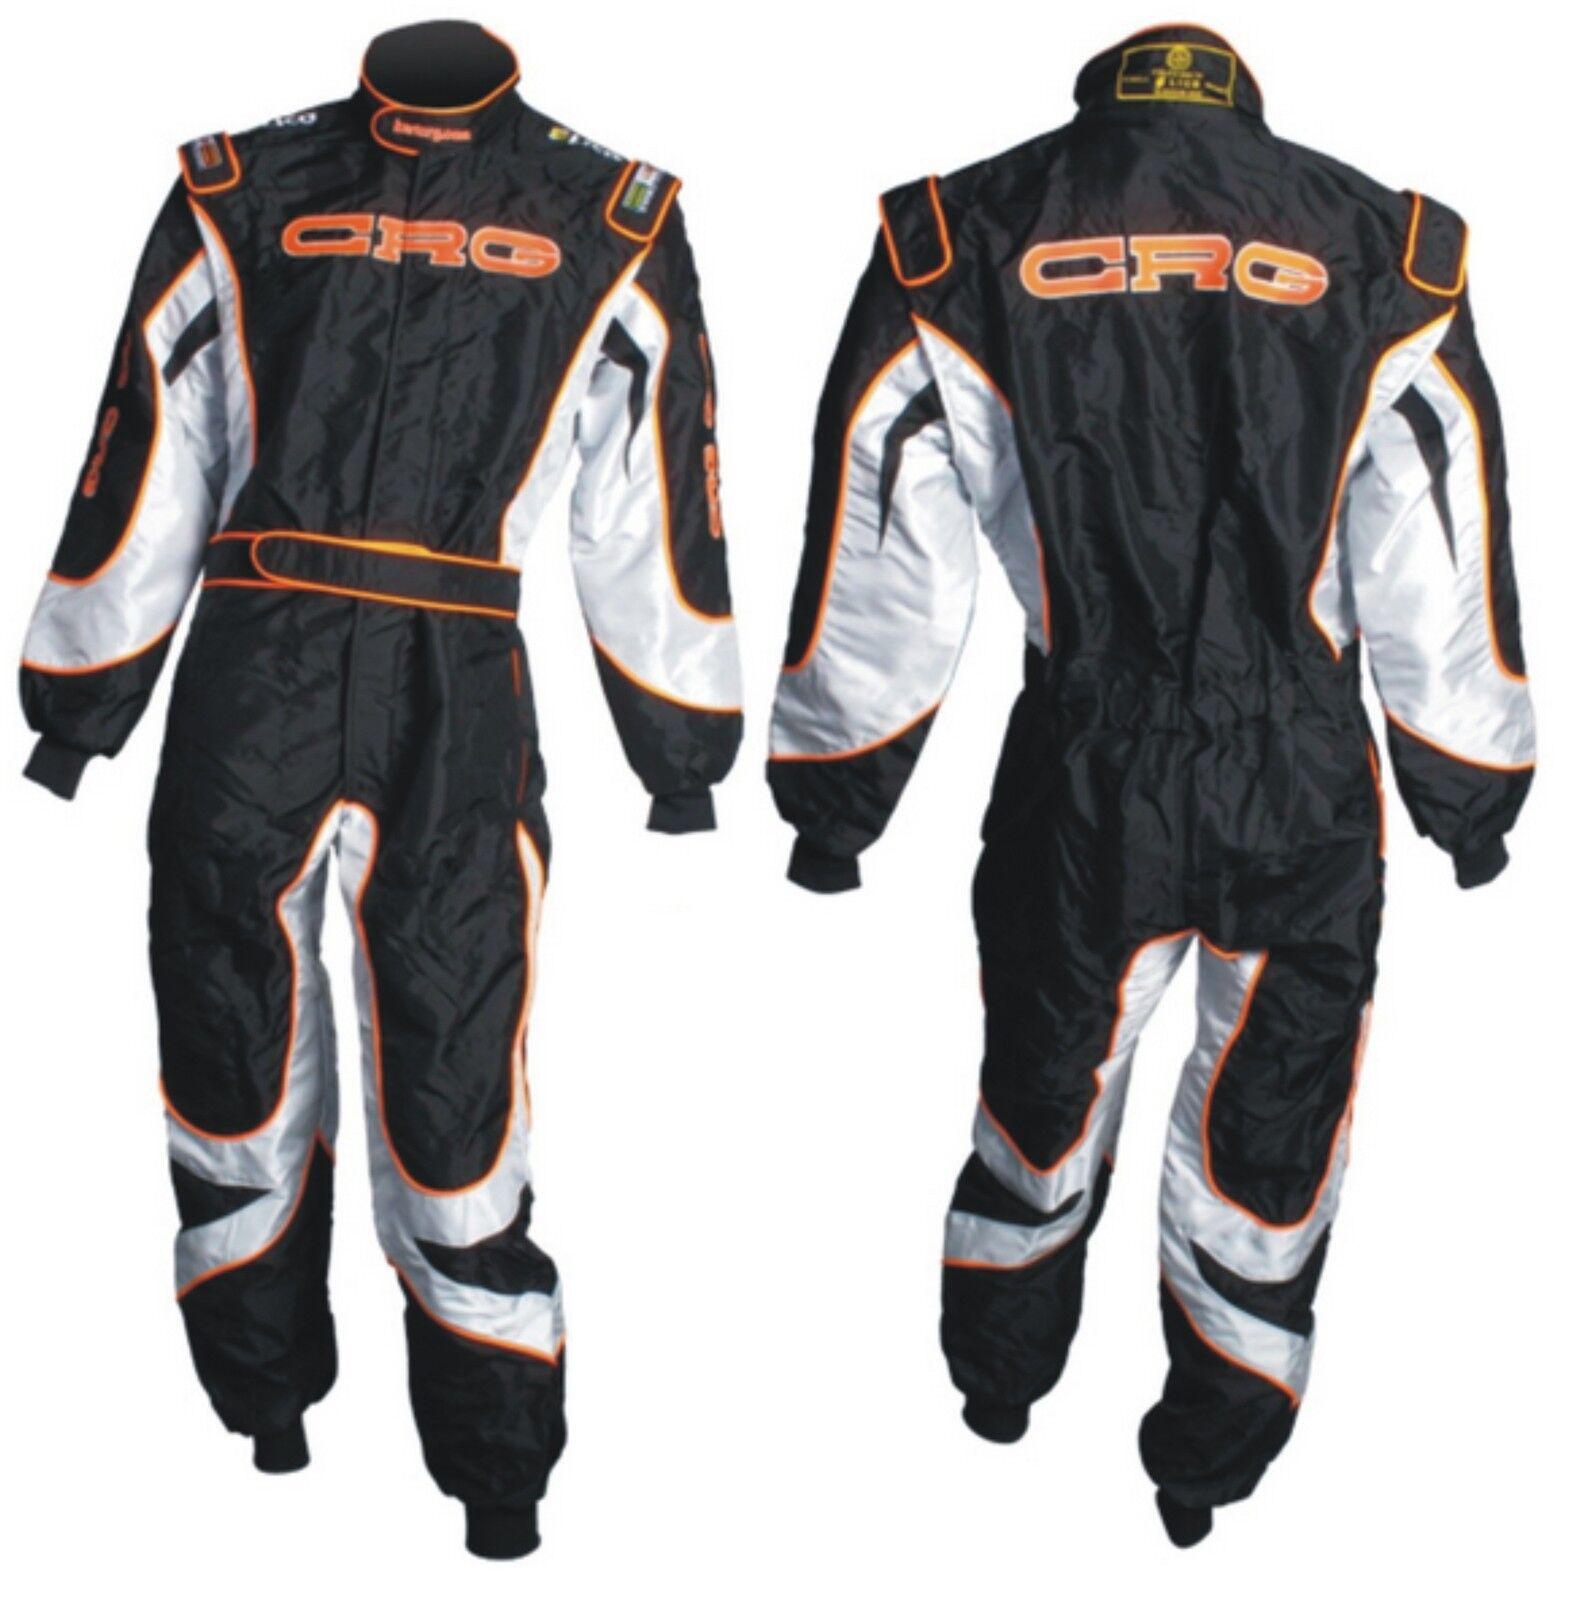 Ny CRG Go Kart Race Suit CIK  FIA nivå 2